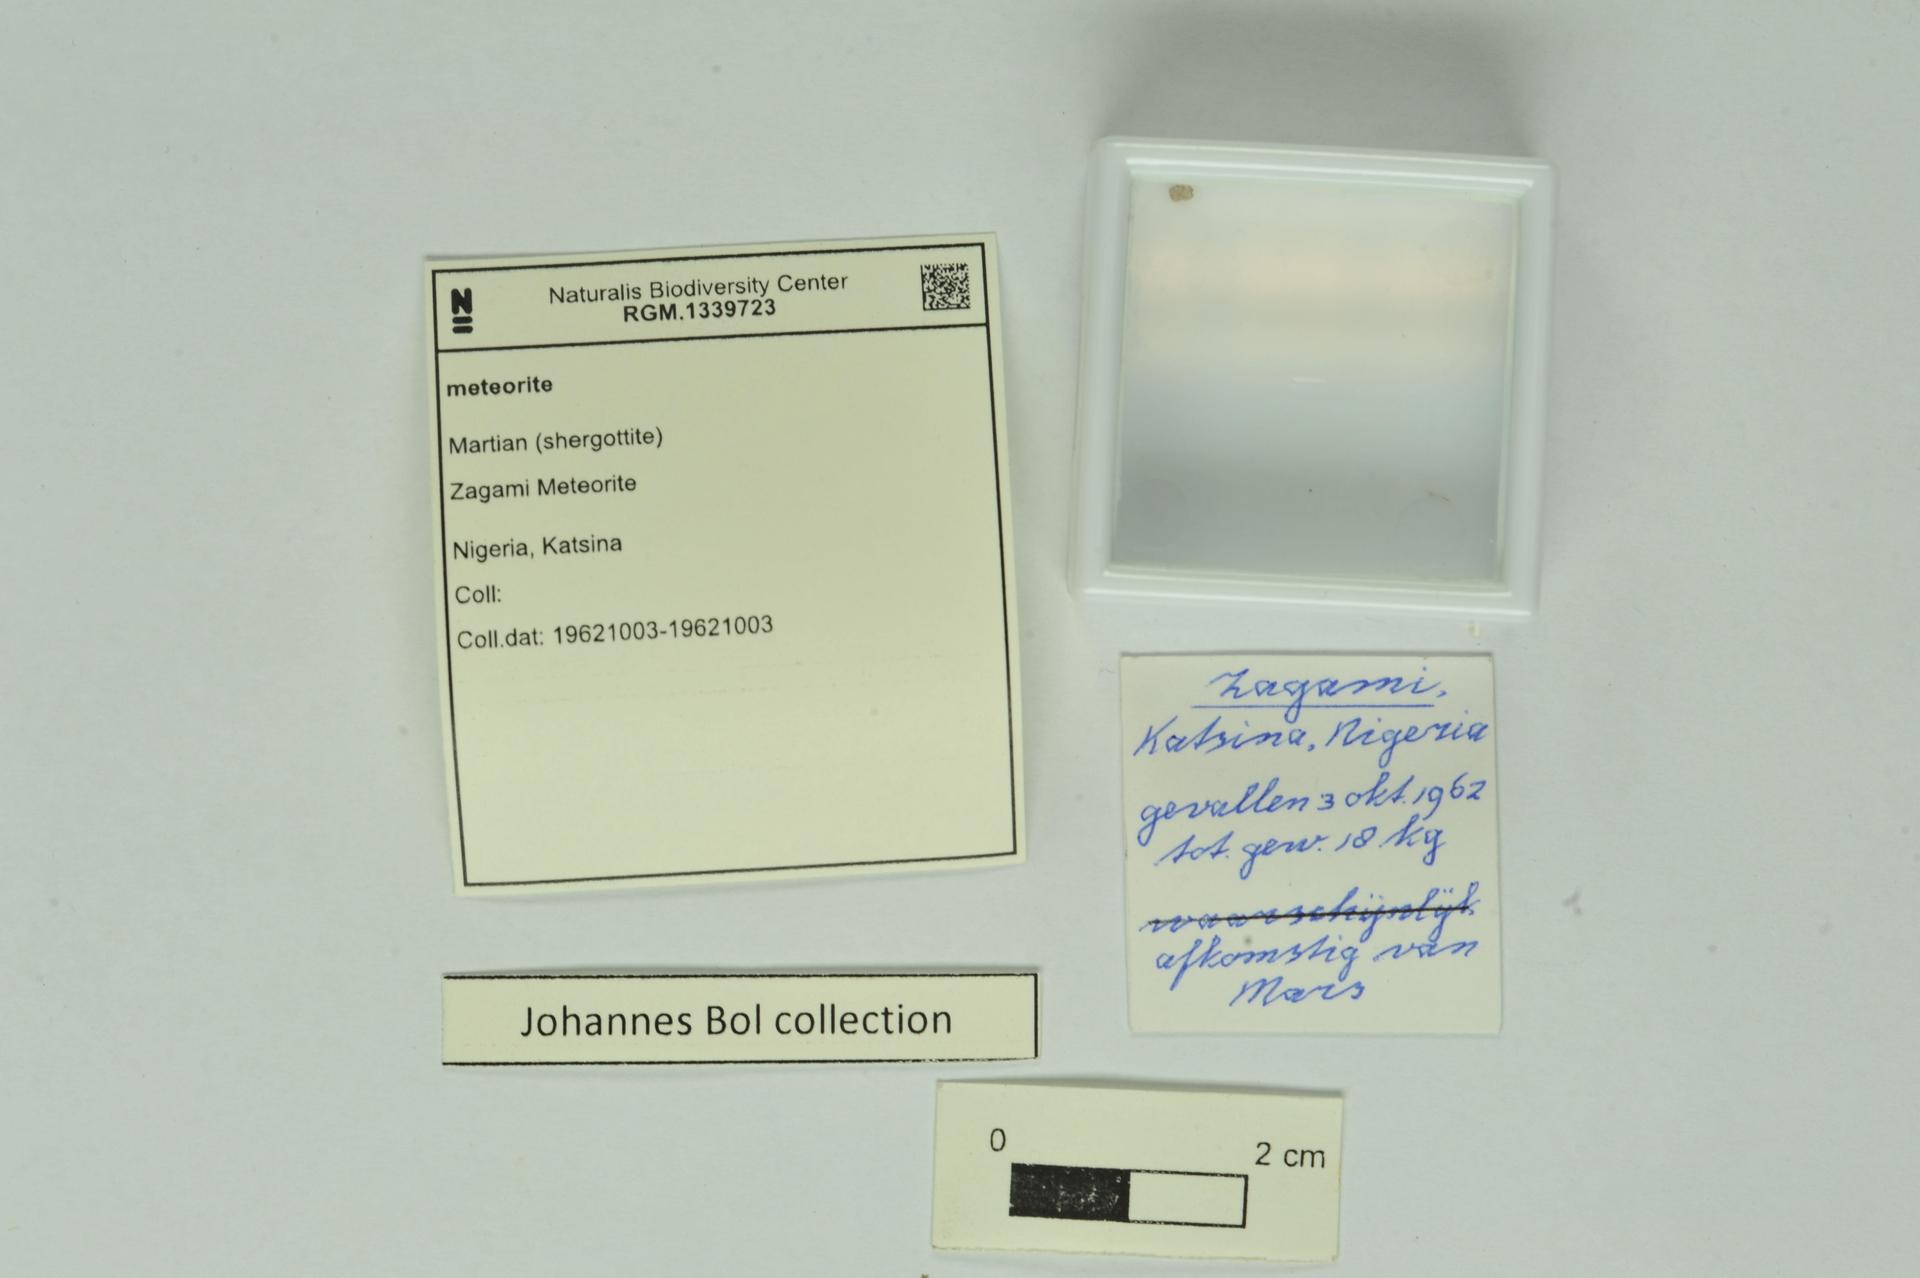 RGM.1339723   Martian (shergottite)